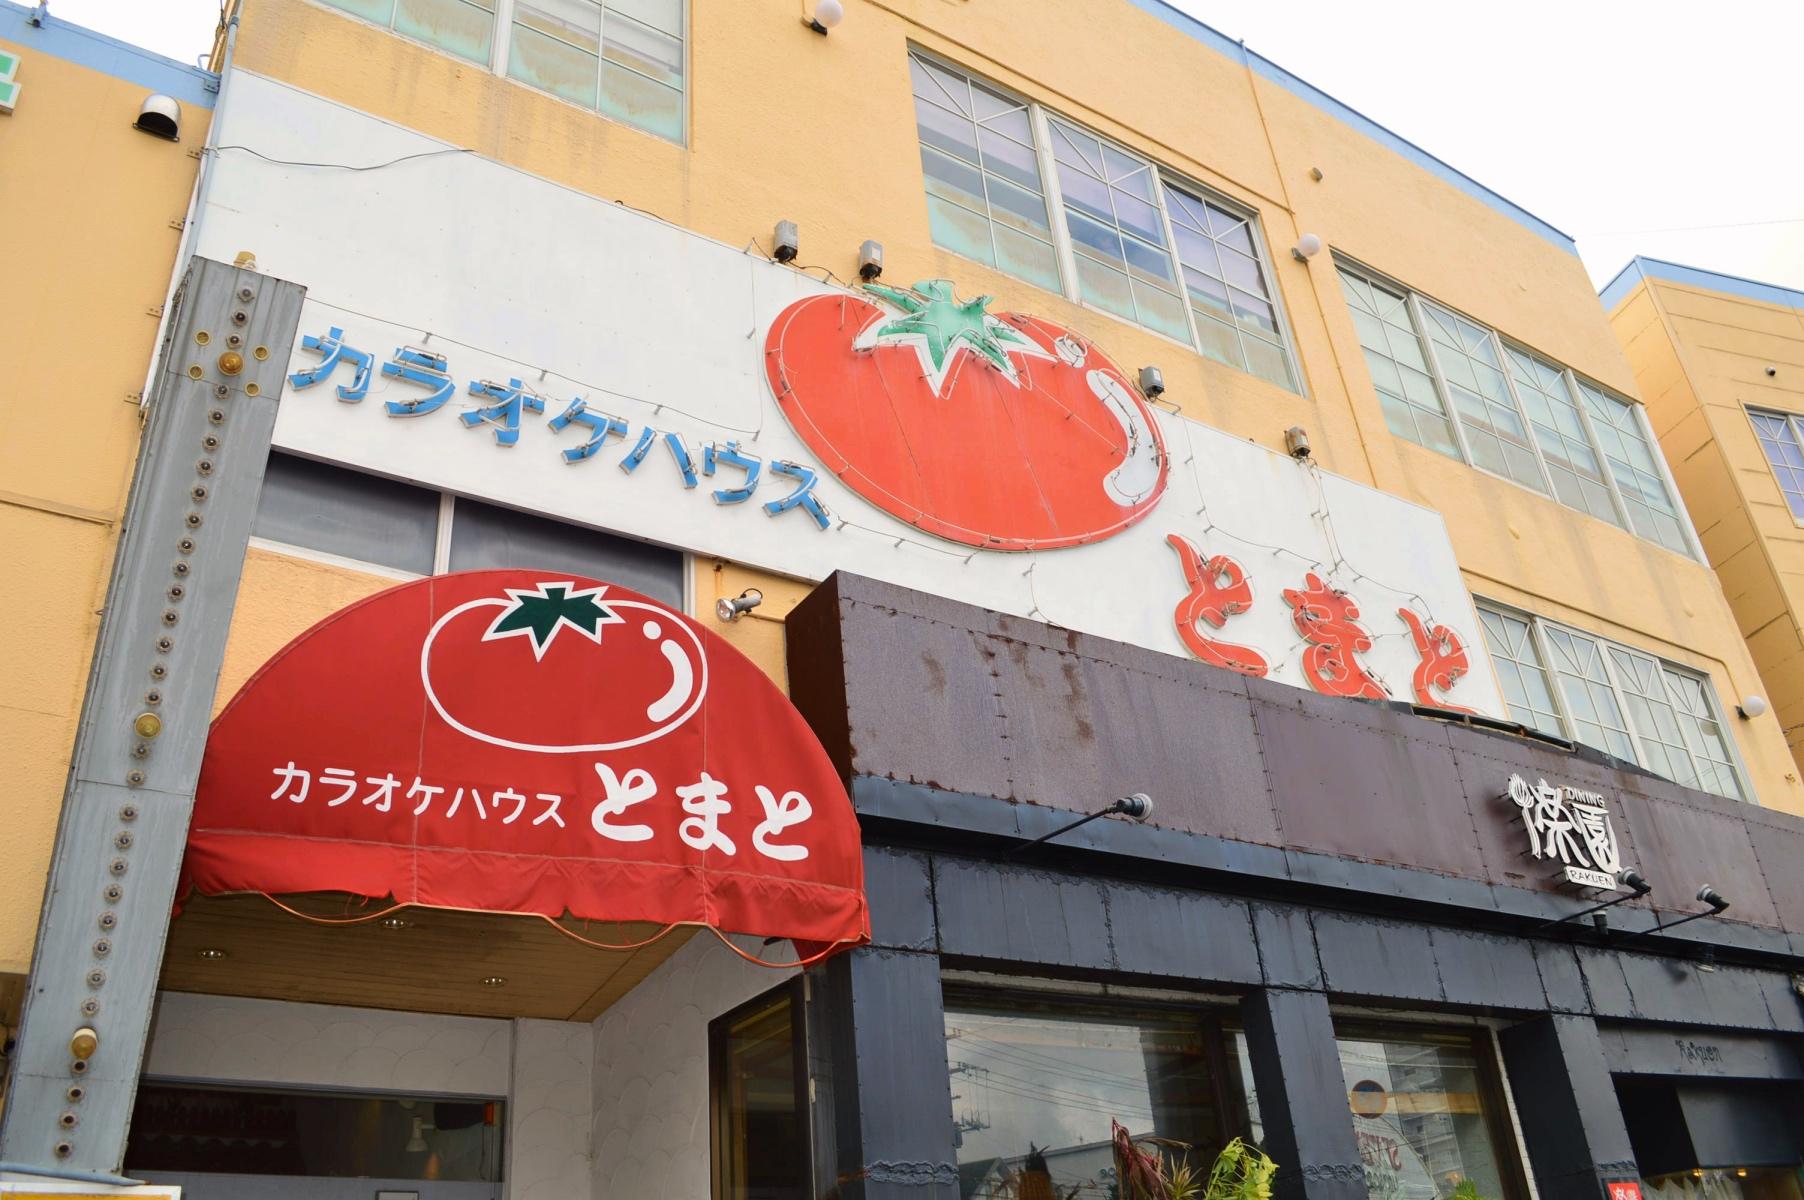 http://ktomato.wp.xdomain.jp/wp-content/uploads/2016/07/uranishi03.jpg